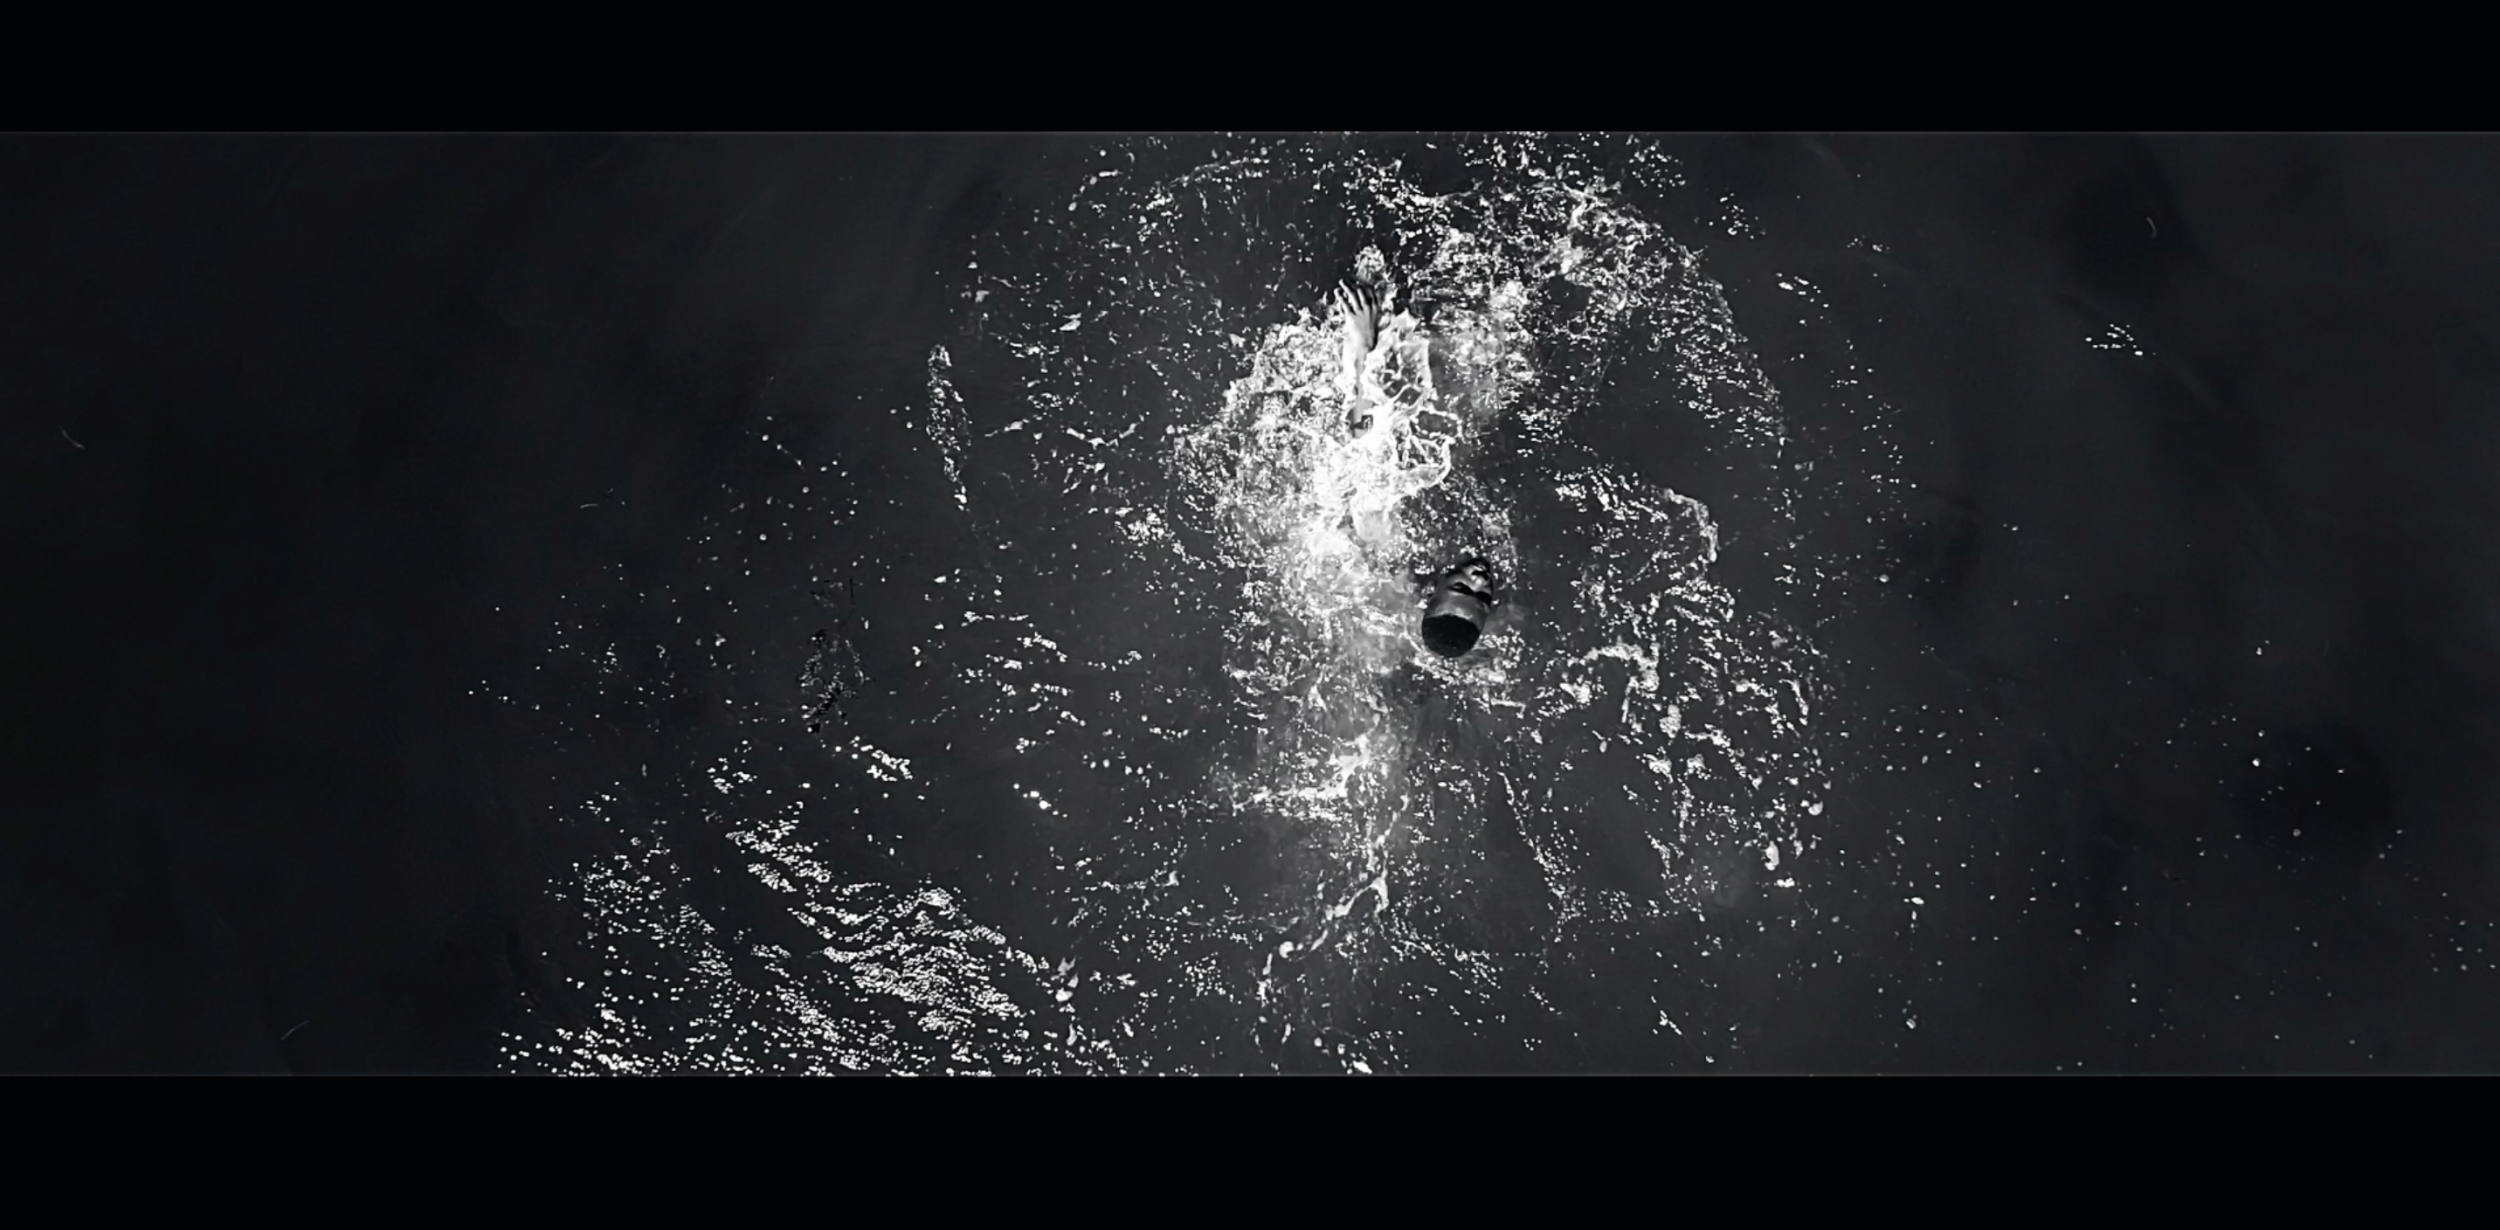 Kill JAY-Z music video by JAY-Z